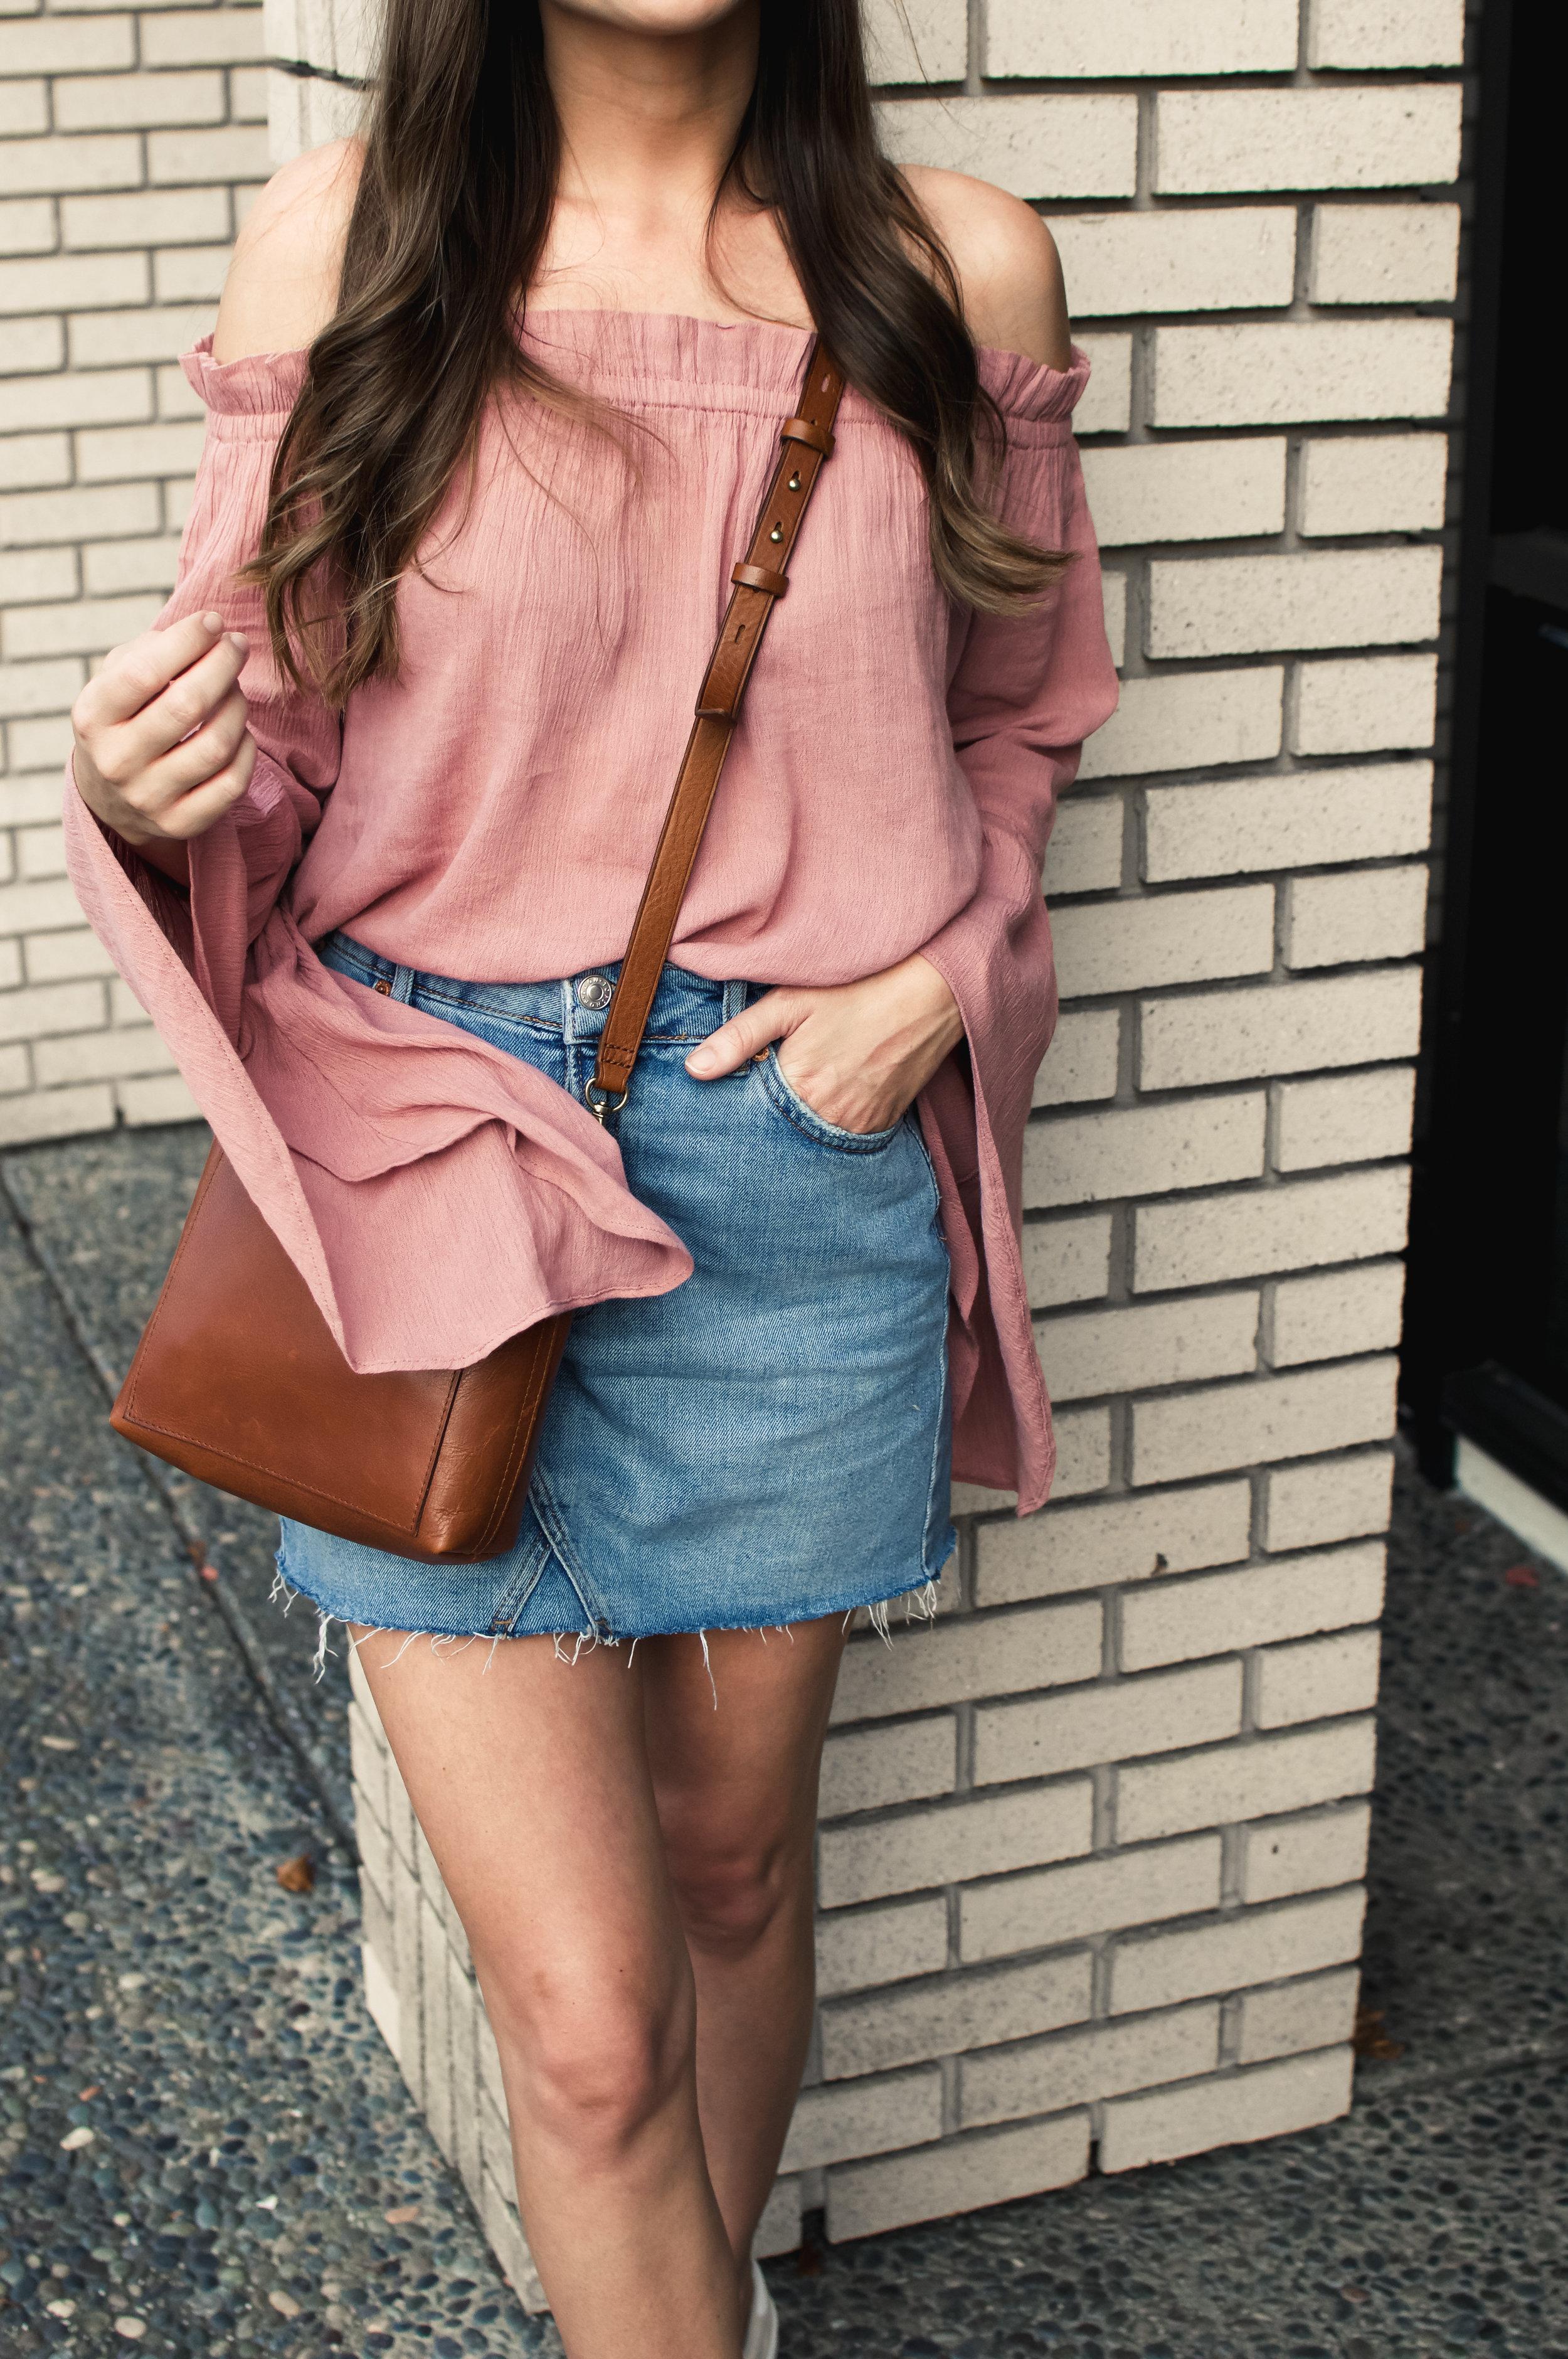 denim skirt and bell sleeve top